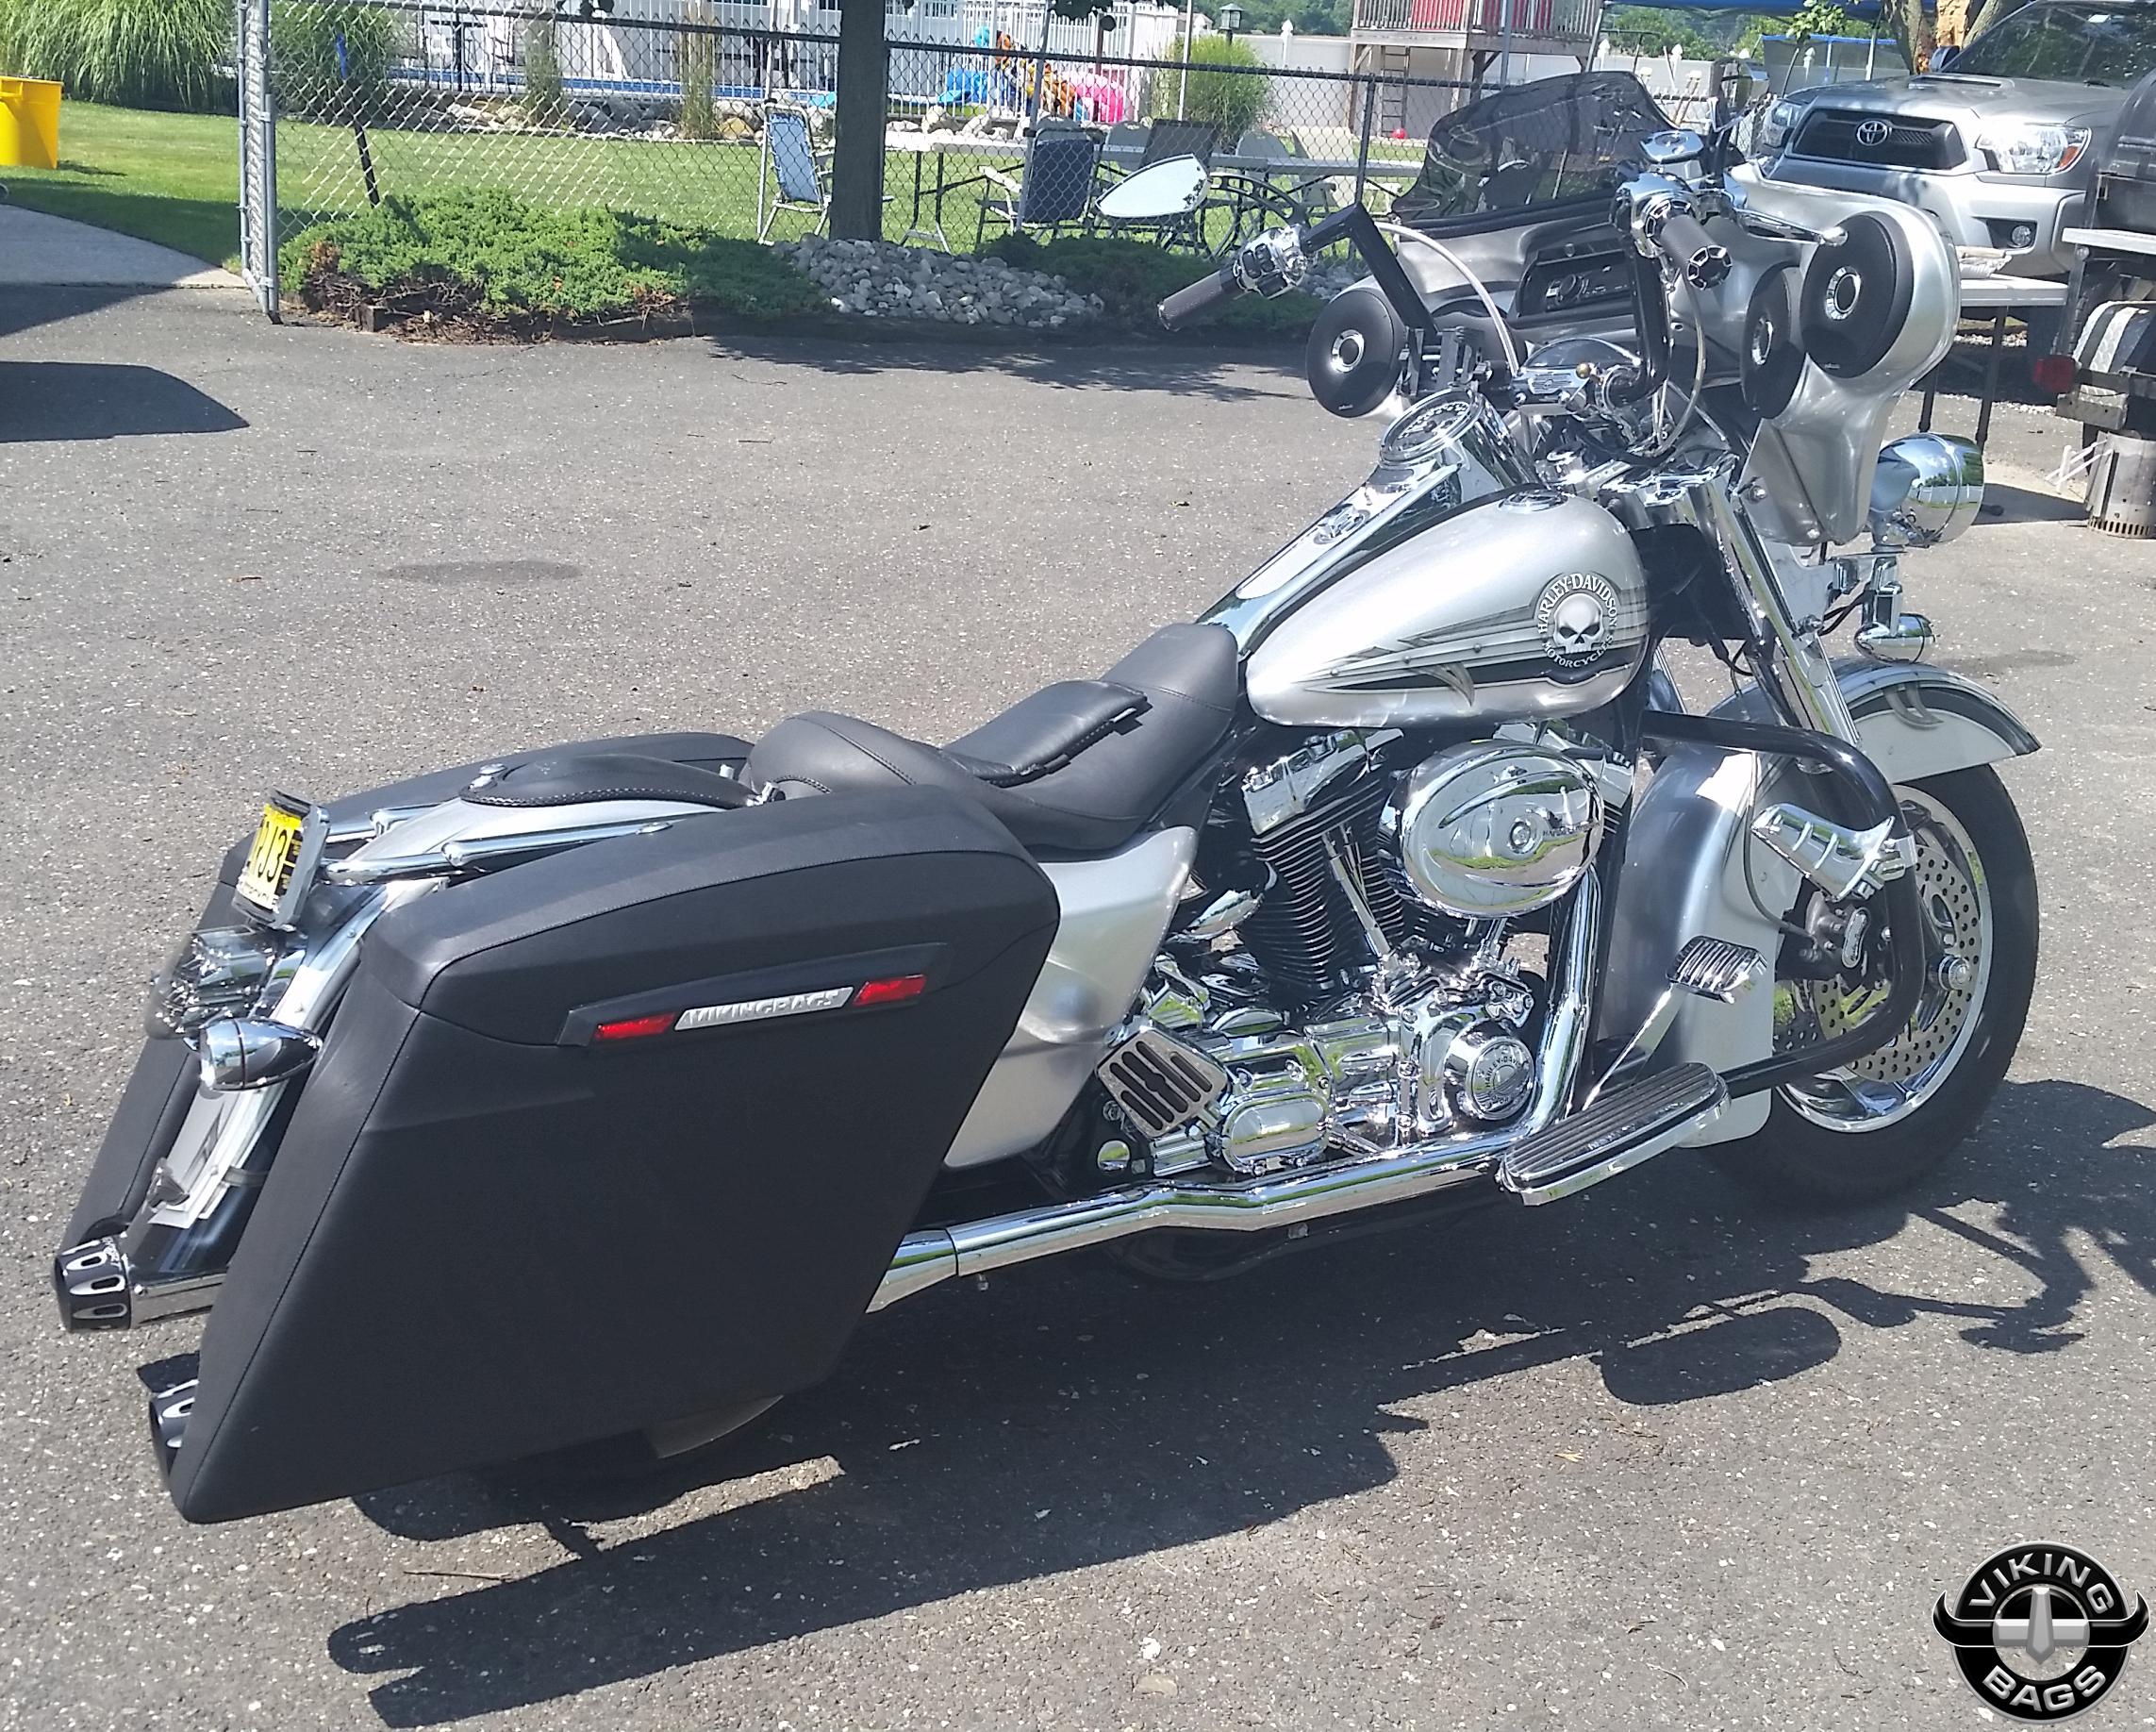 Harley Touring Saddlebags  Shop Bags for Harley Touring